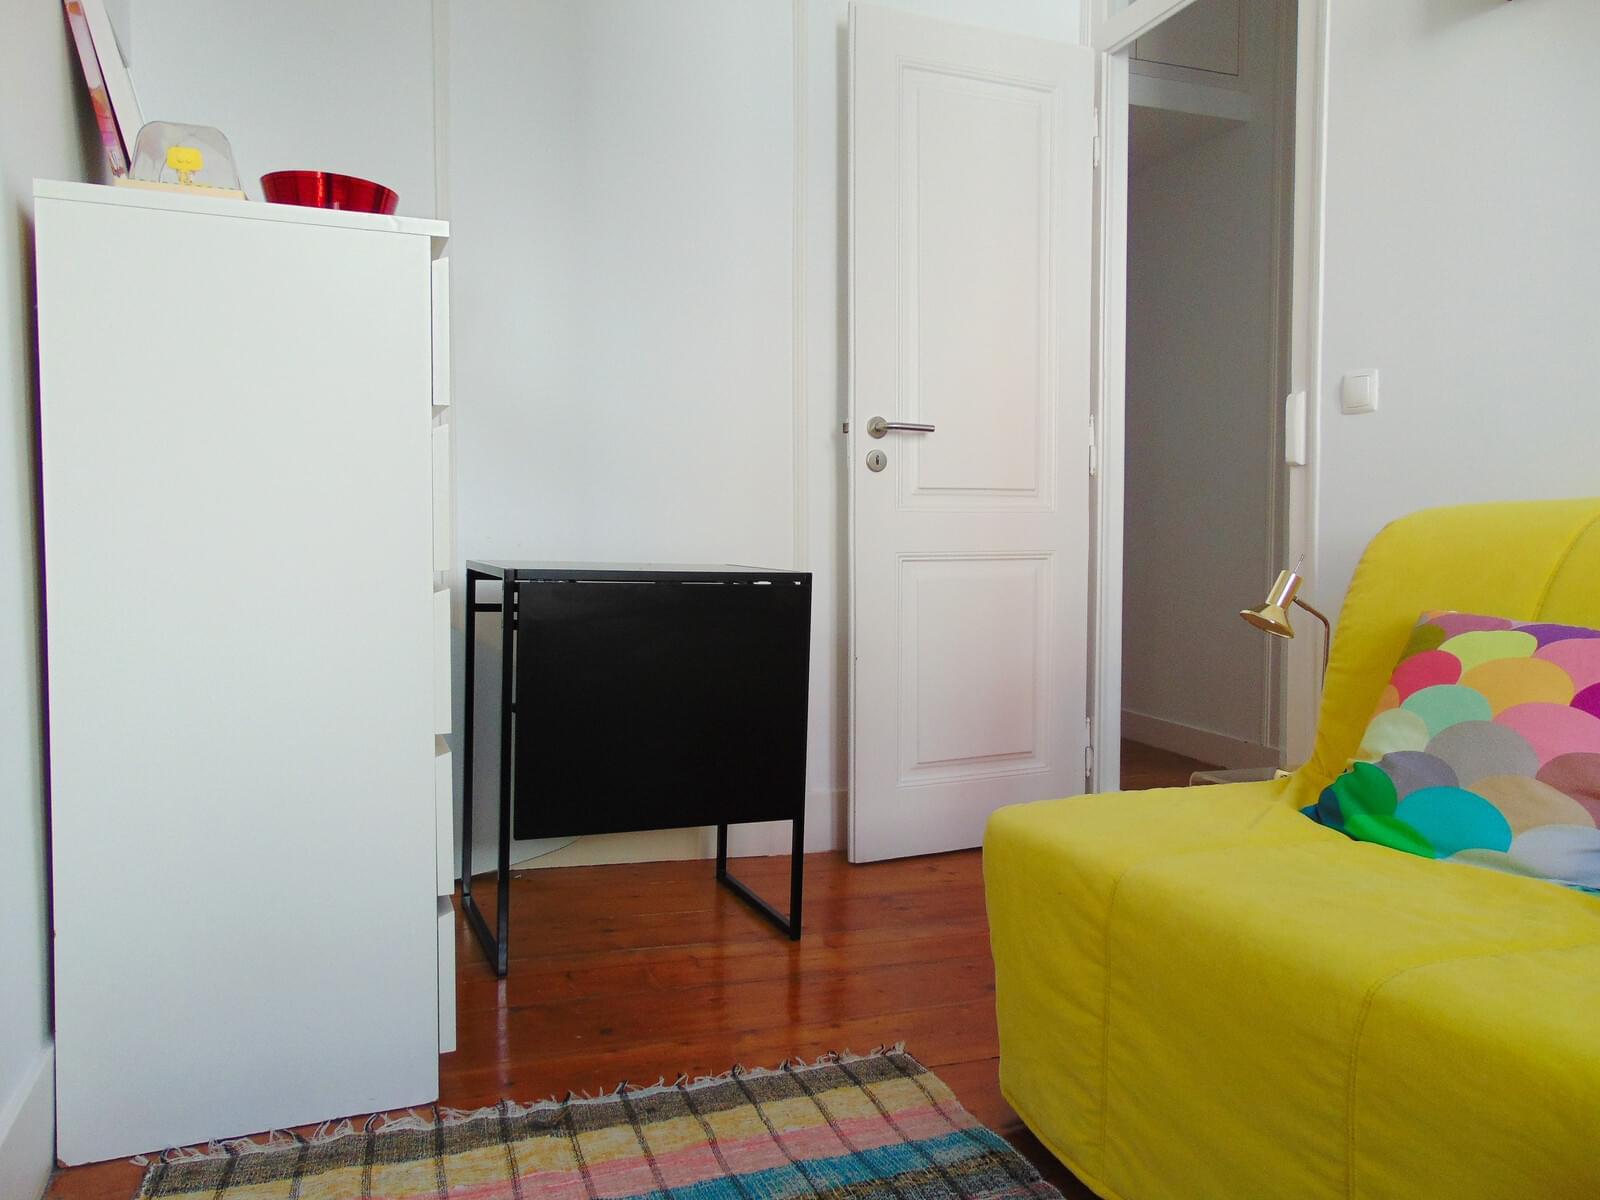 pf18269-apartamento-t1-lisboa-8cdc9daa-cc91-4143-8318-4fd9e671ef19